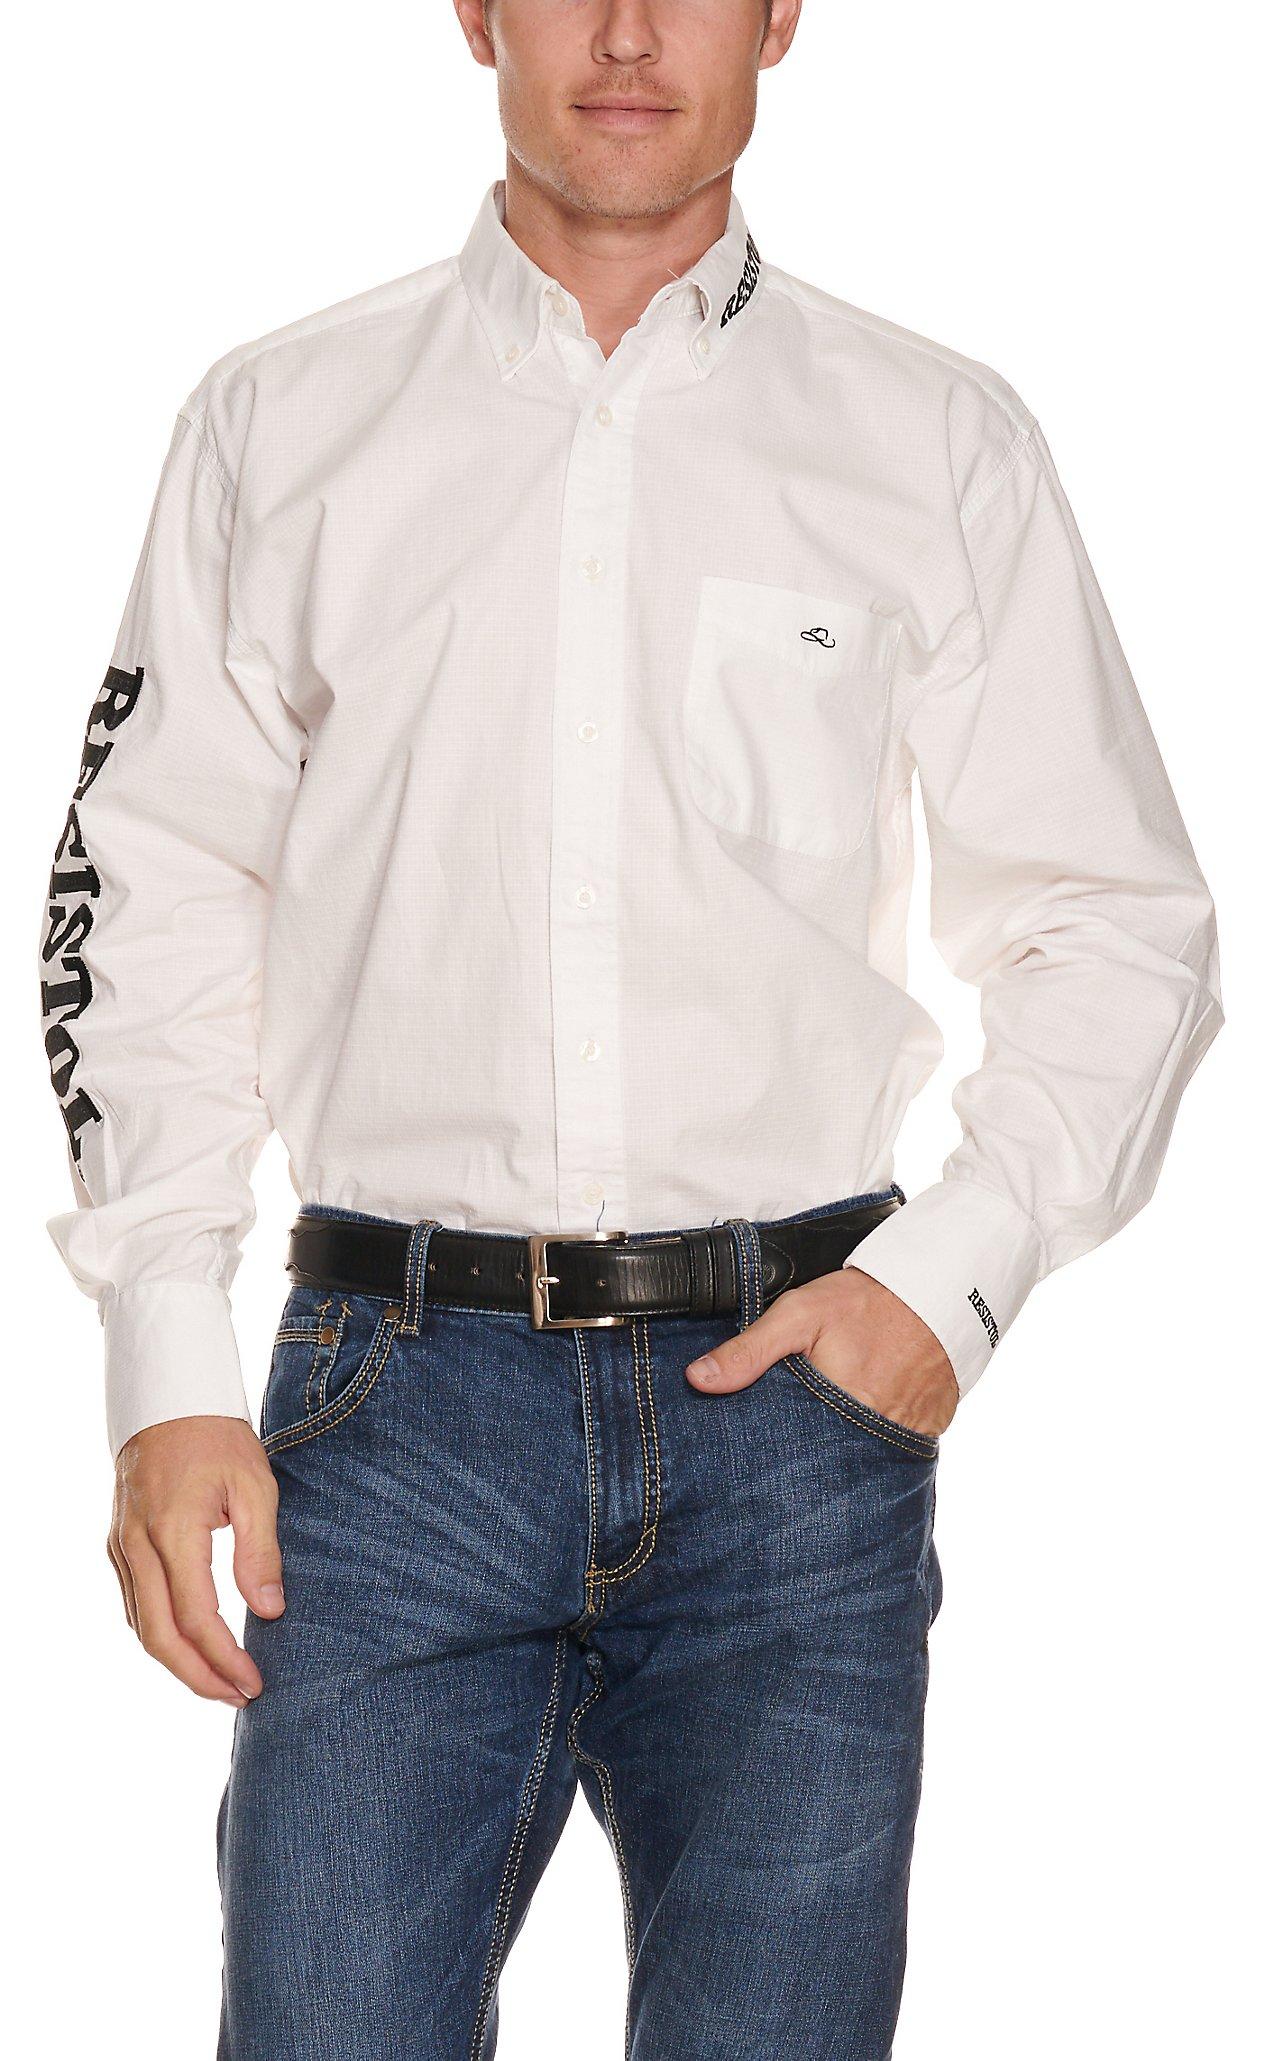 Resistol Mens White Marketing Western Snap Shirt Cavenders